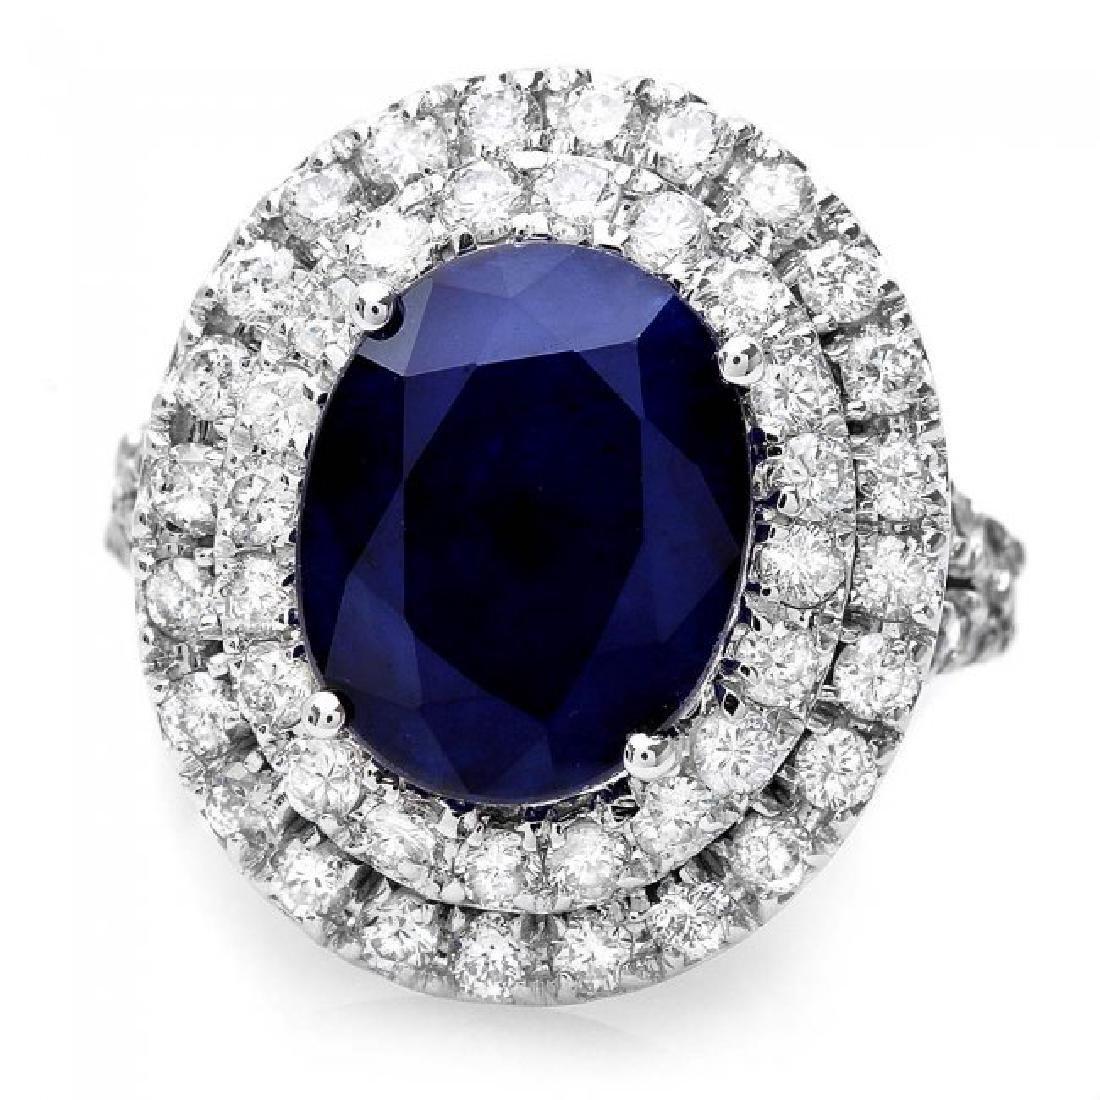 14k Gold 5.00ct Sapphire 2.00ct Diamond Ring - 2